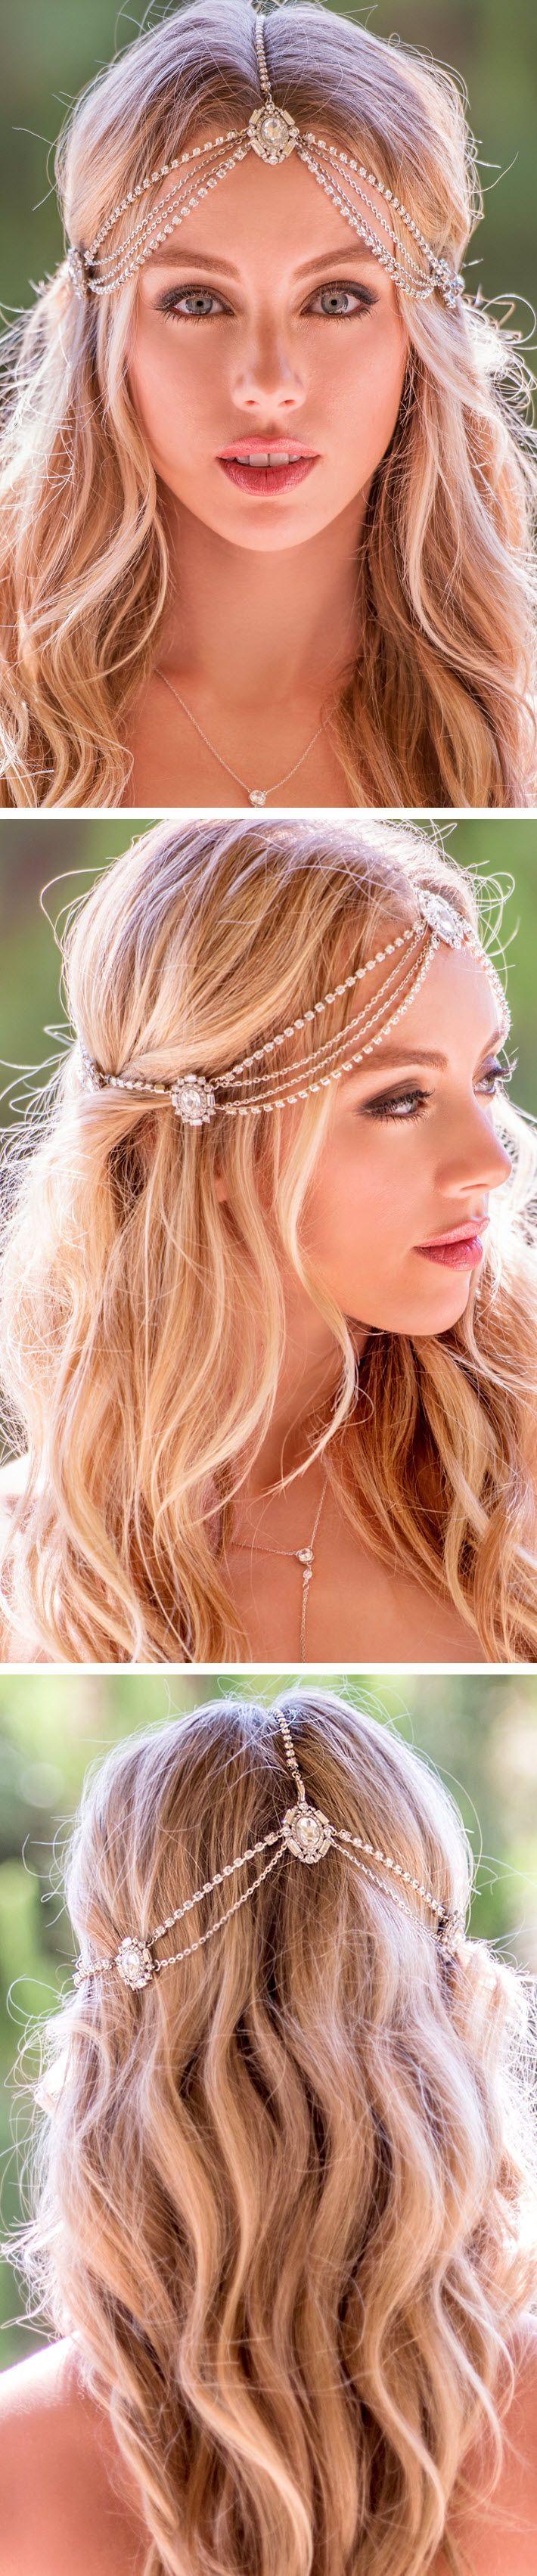 Swoon over jannie baltzer s wild nature bridal headpiece collection - Best 25 Bridal Headpieces Ideas On Pinterest Bridal Hair Accessories Bohemian Headpiece And Bridal Accessories